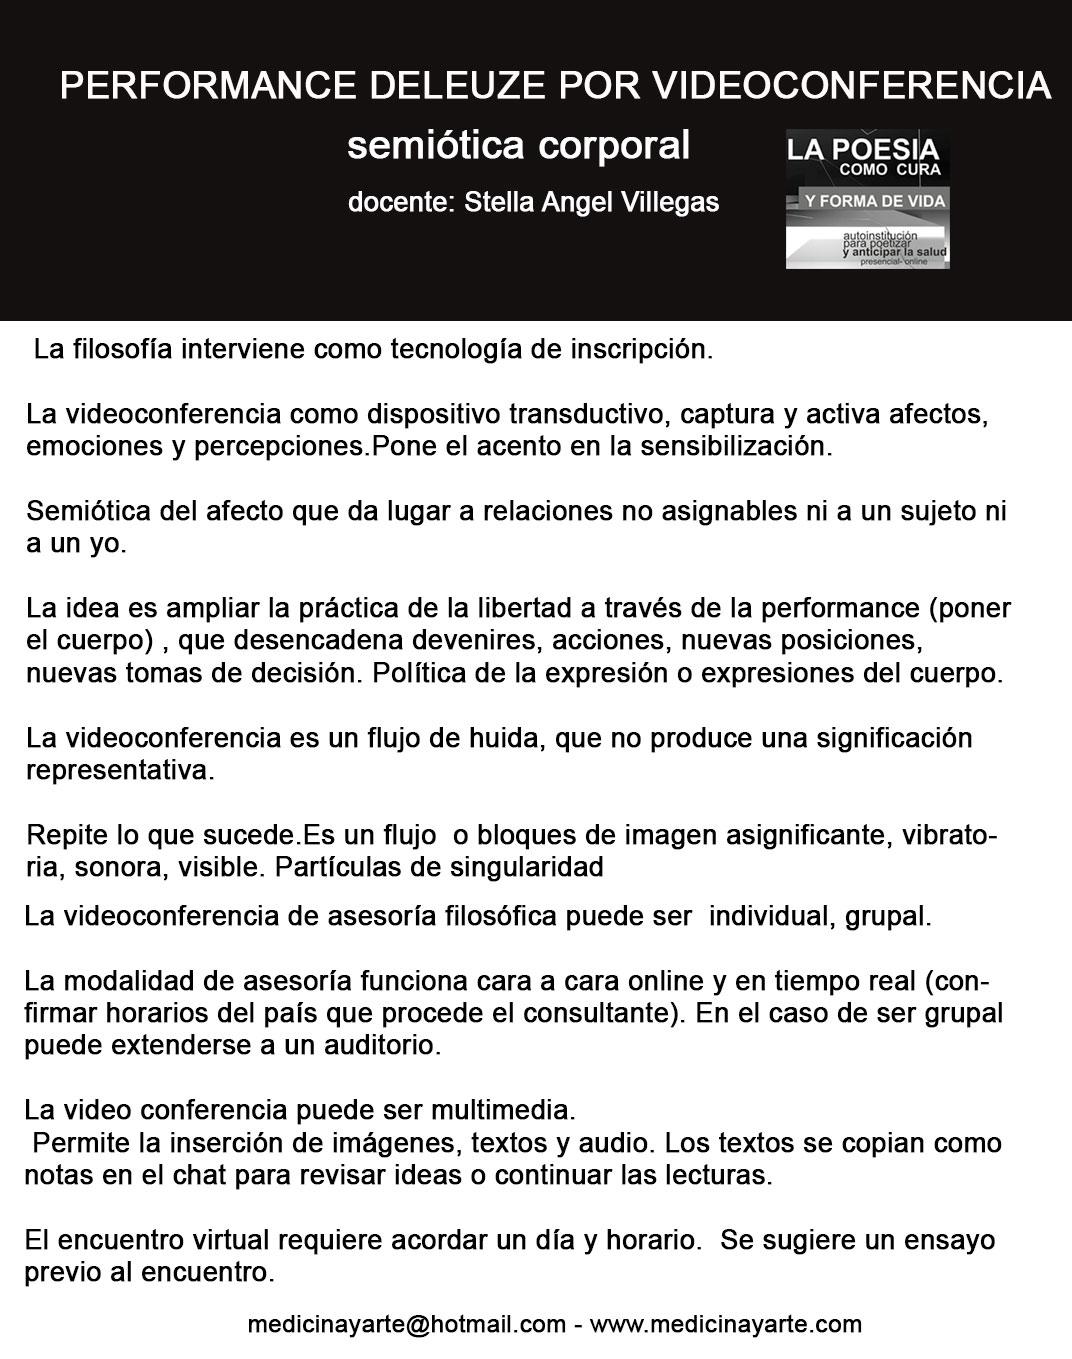 http://medicinayarte.com/img/performance_deleuze_videoconferencia.jpg